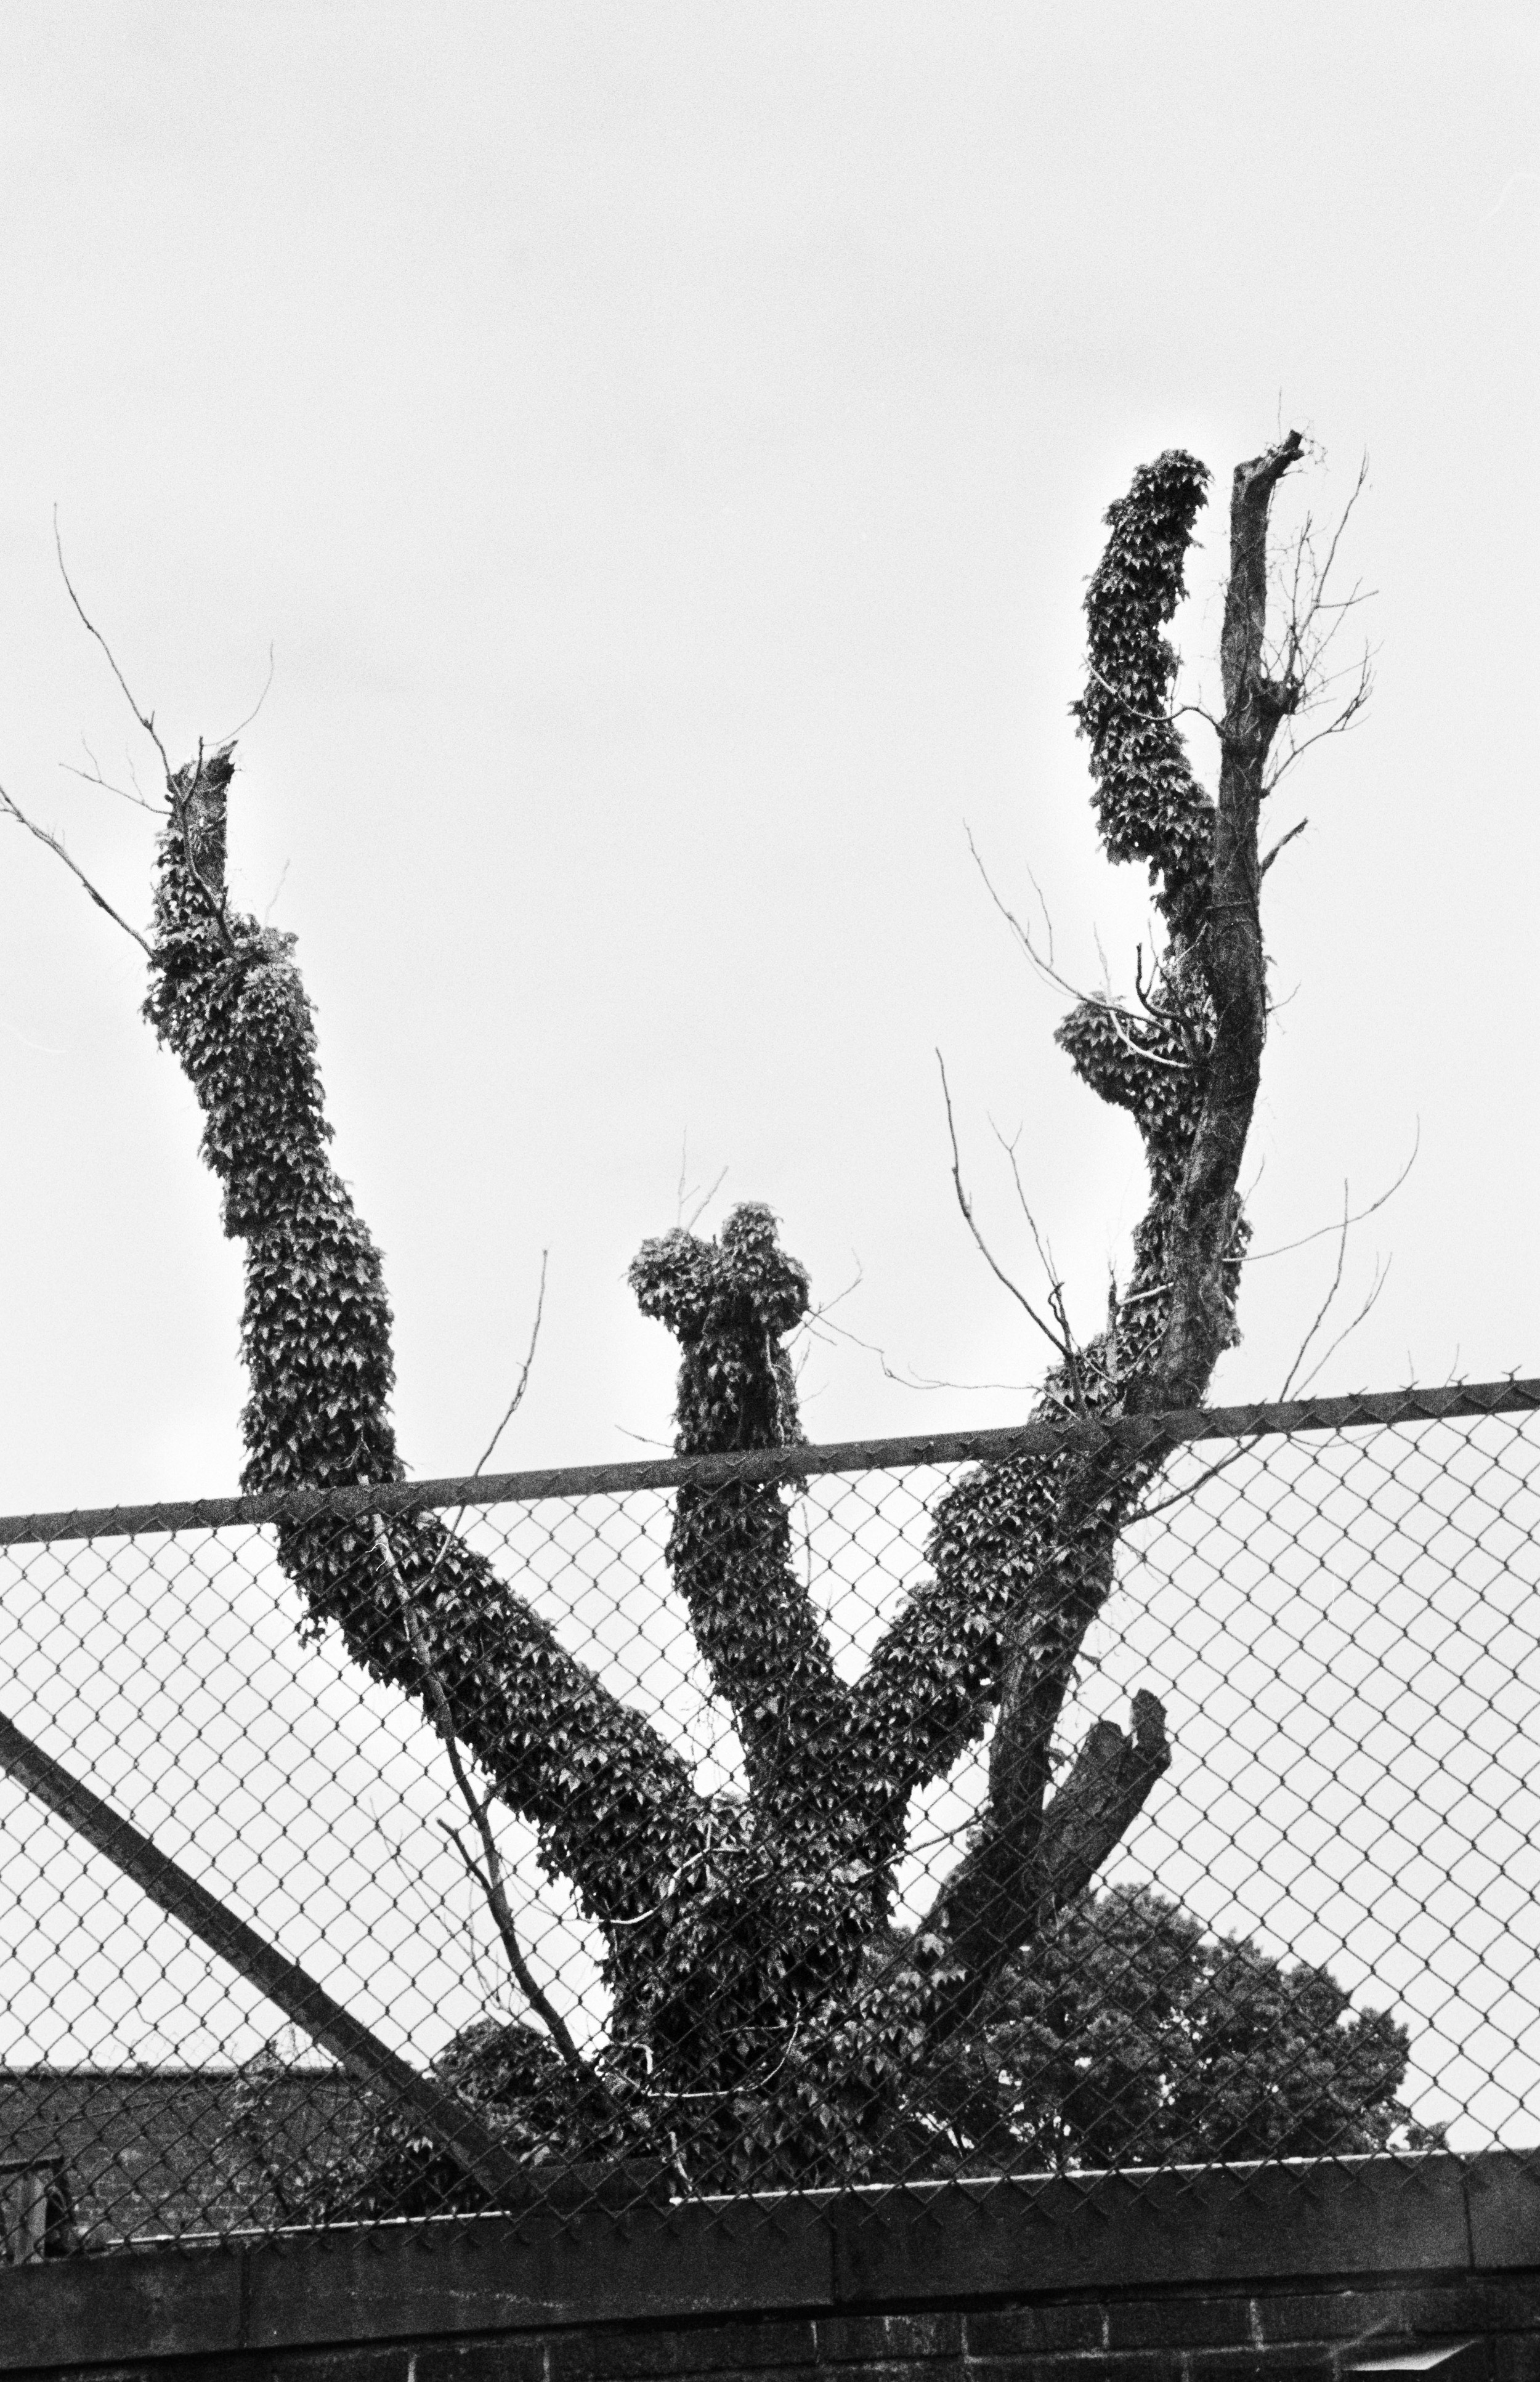 W TreeByWarriorsTunnel.jpg